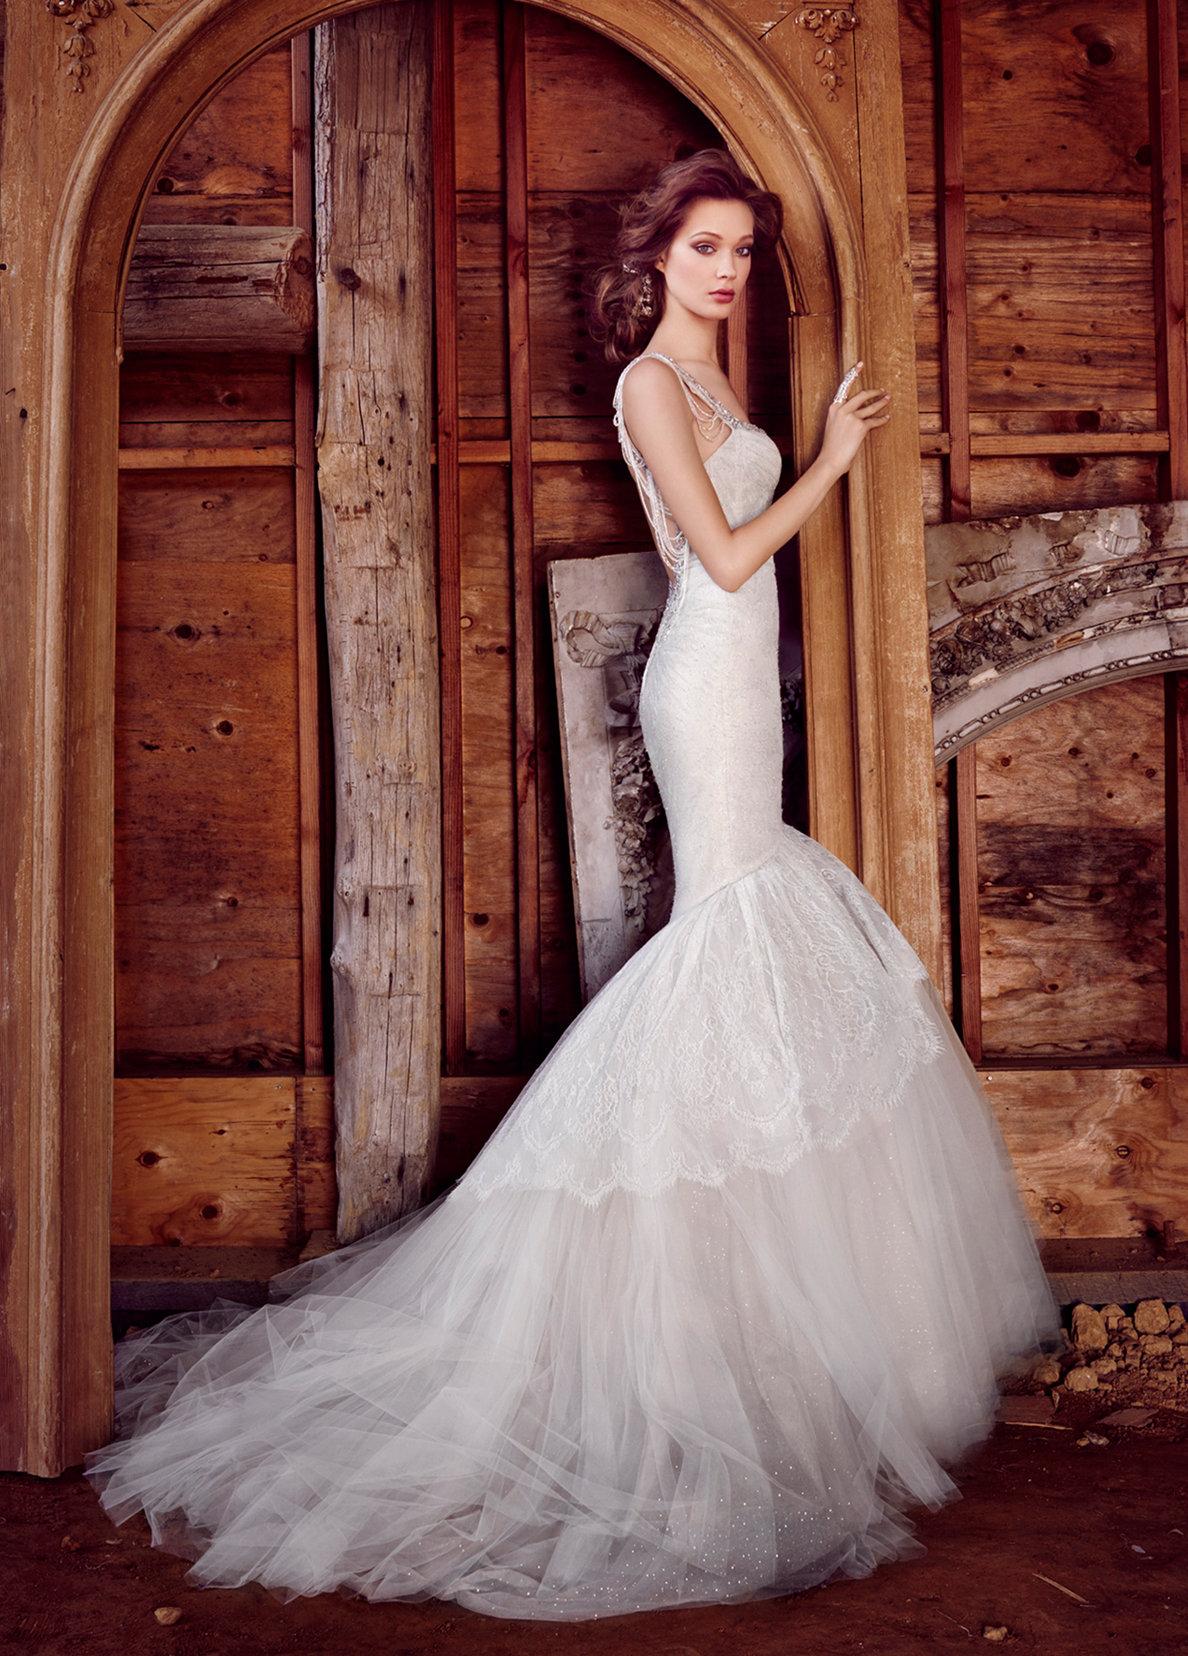 One of Lazaro's Bridal Models